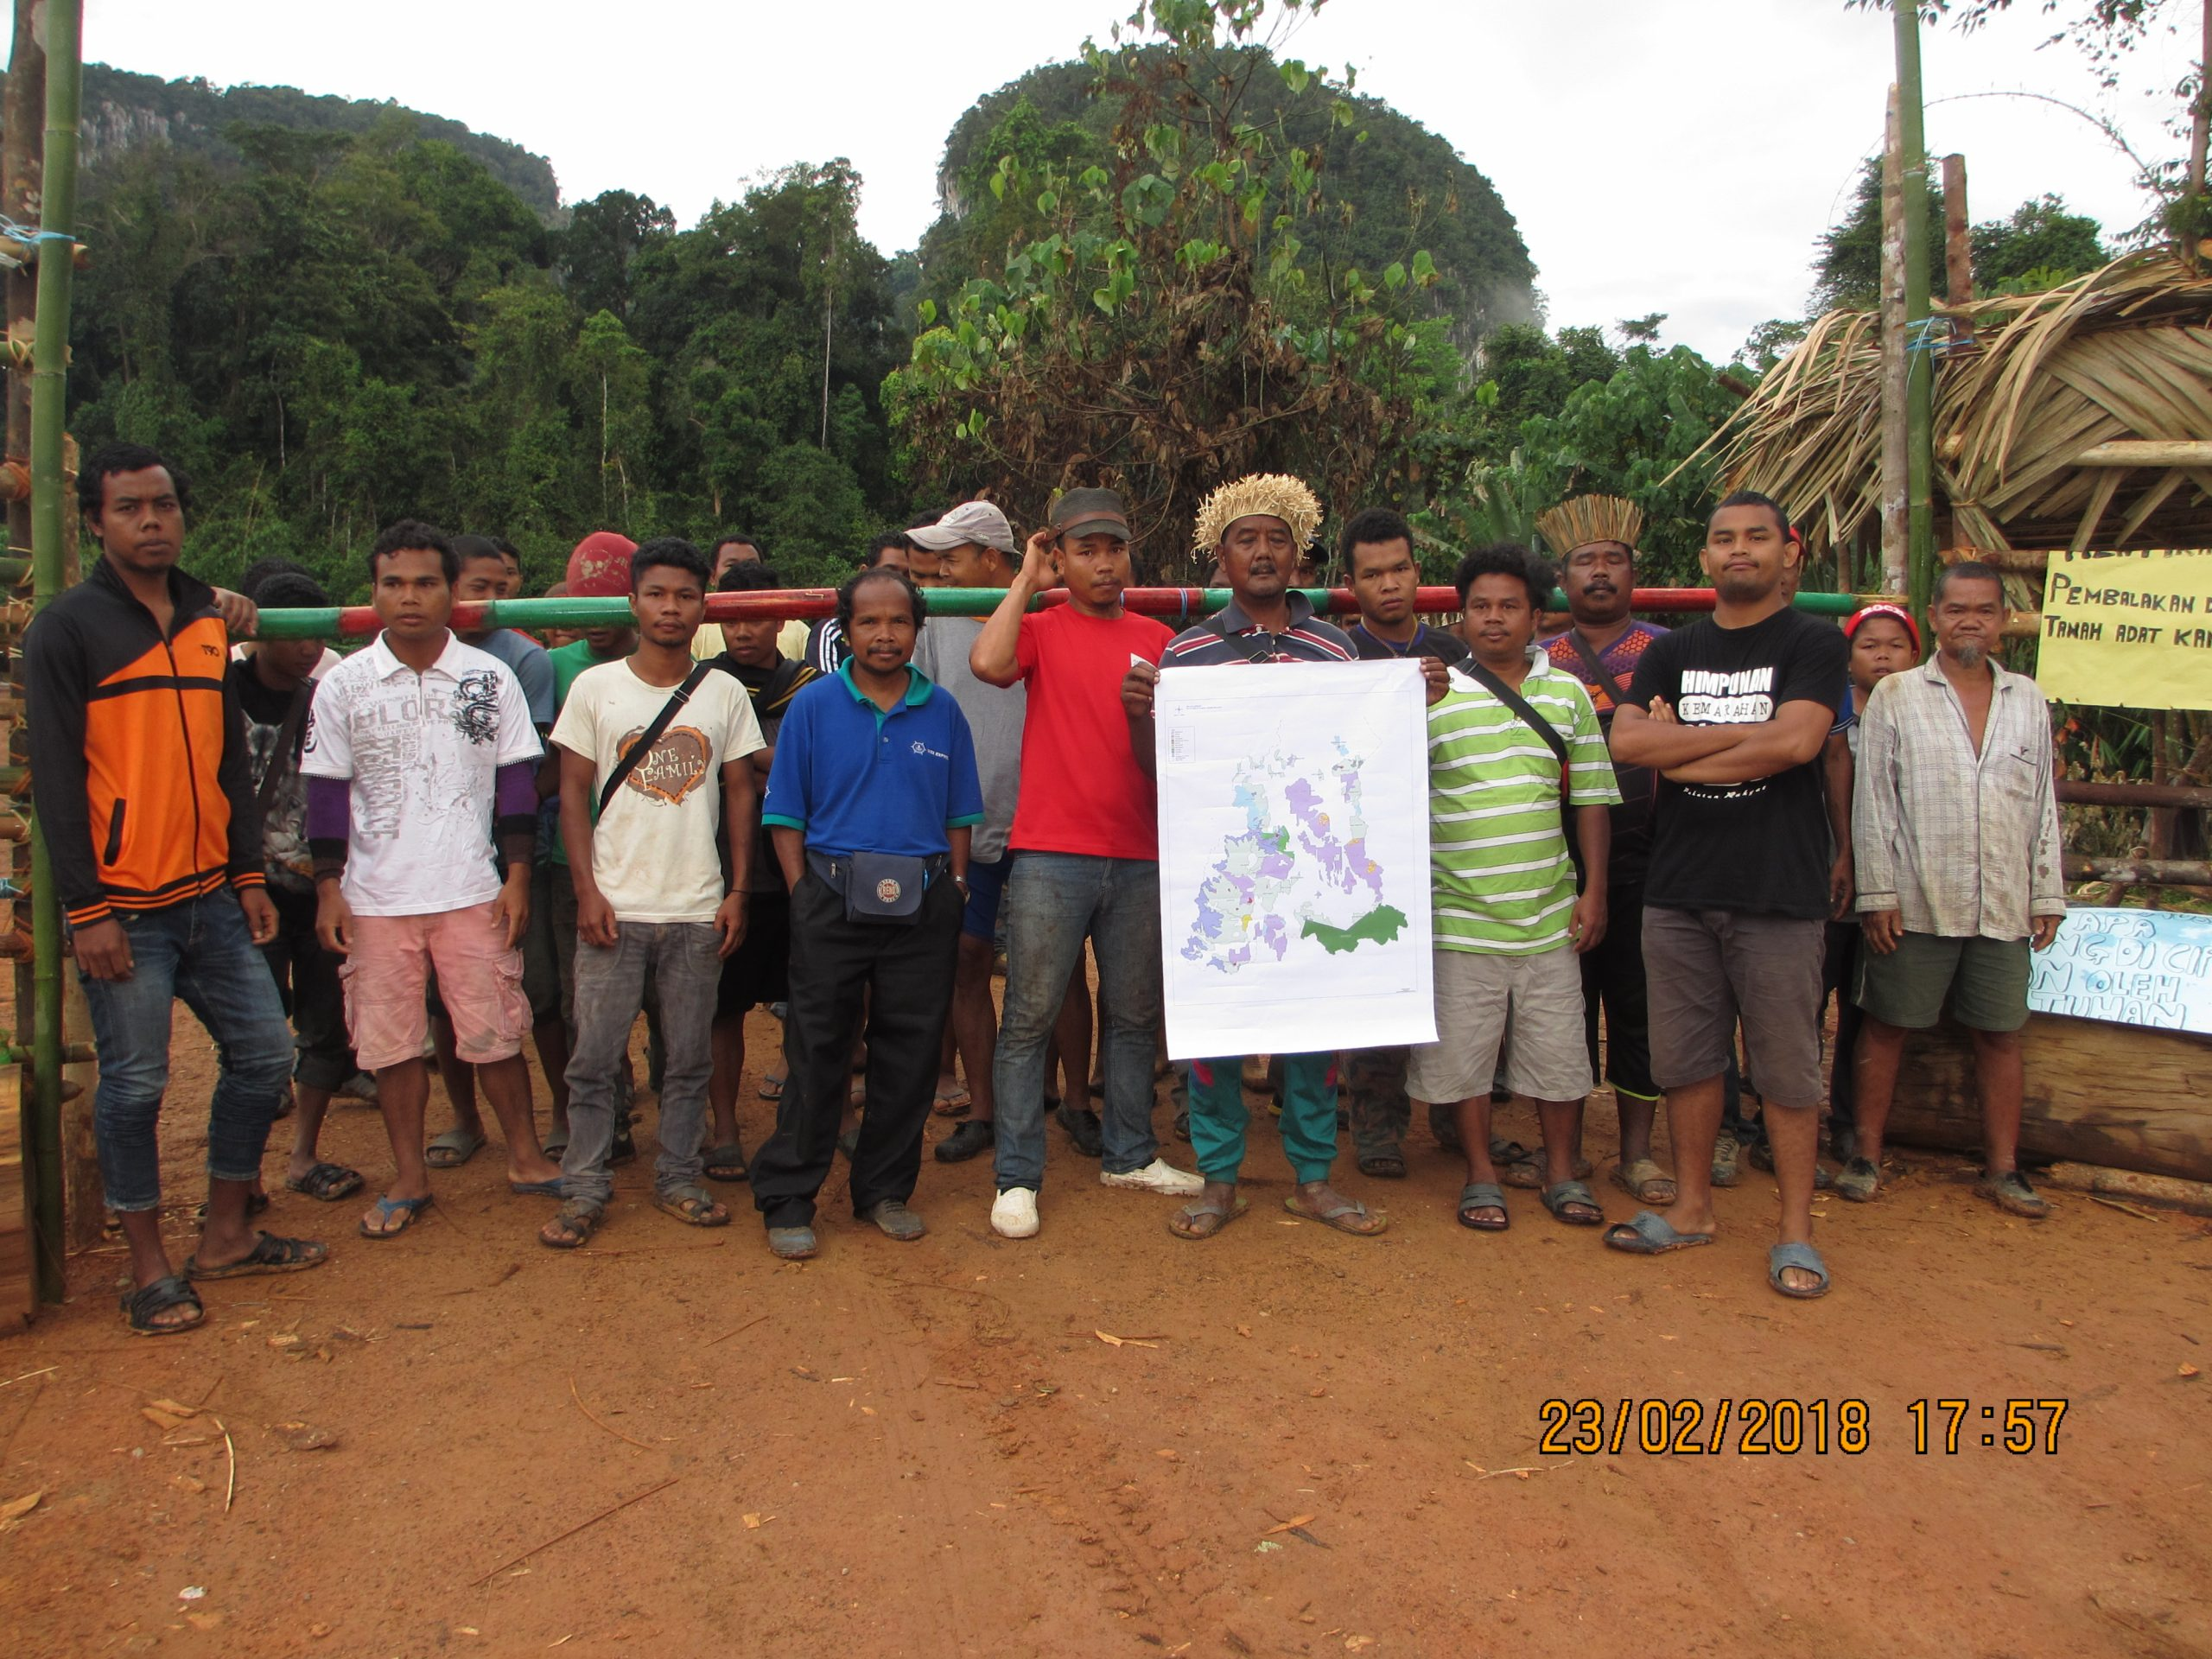 Blockade in Cawas, Gua Musang | SAM